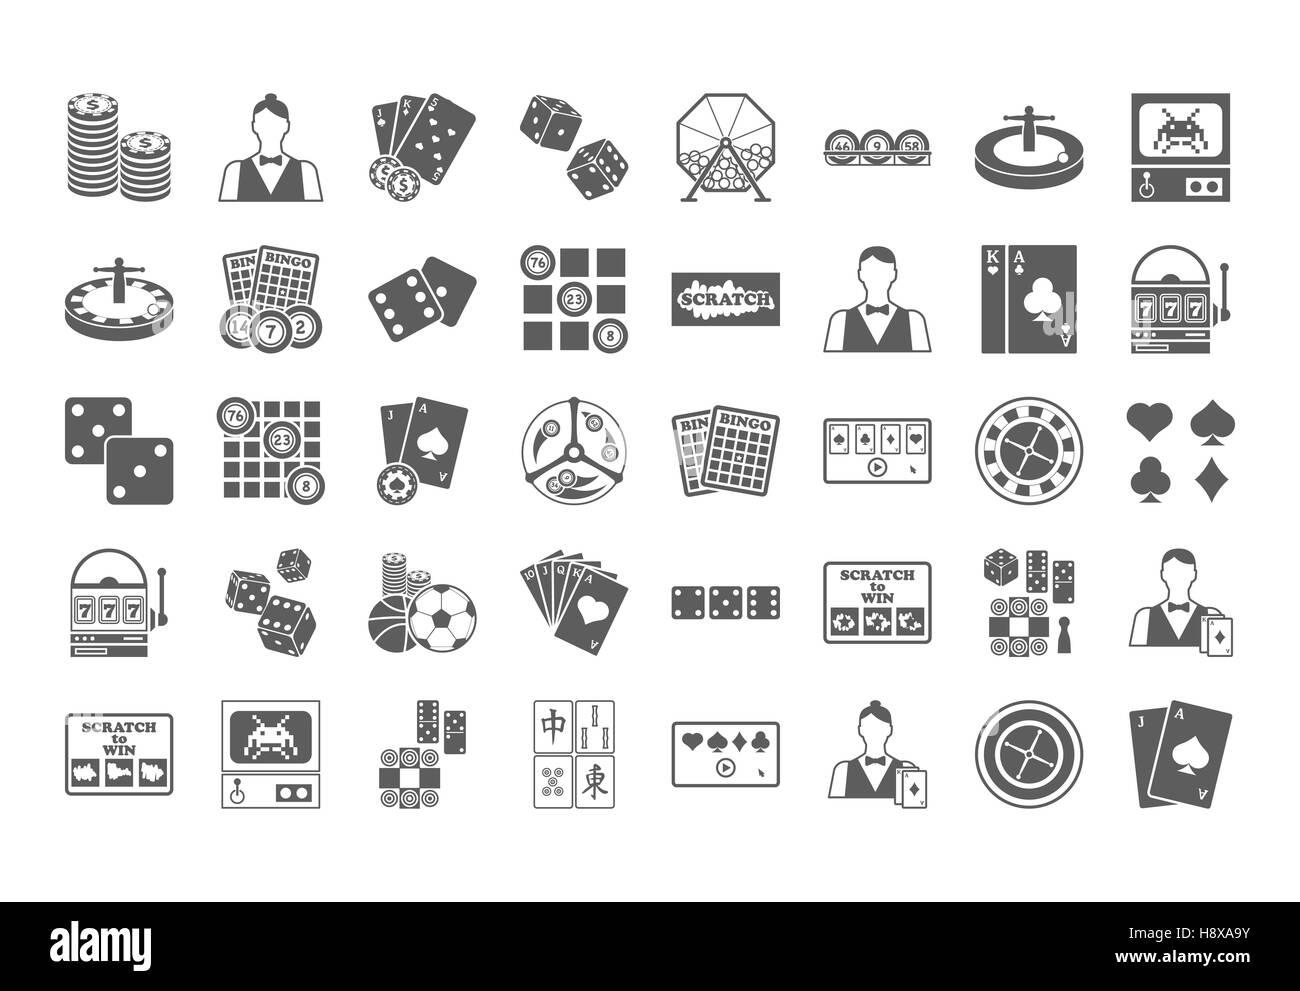 Casino icon. Vector Illustration isolated on white background. - Stock Image